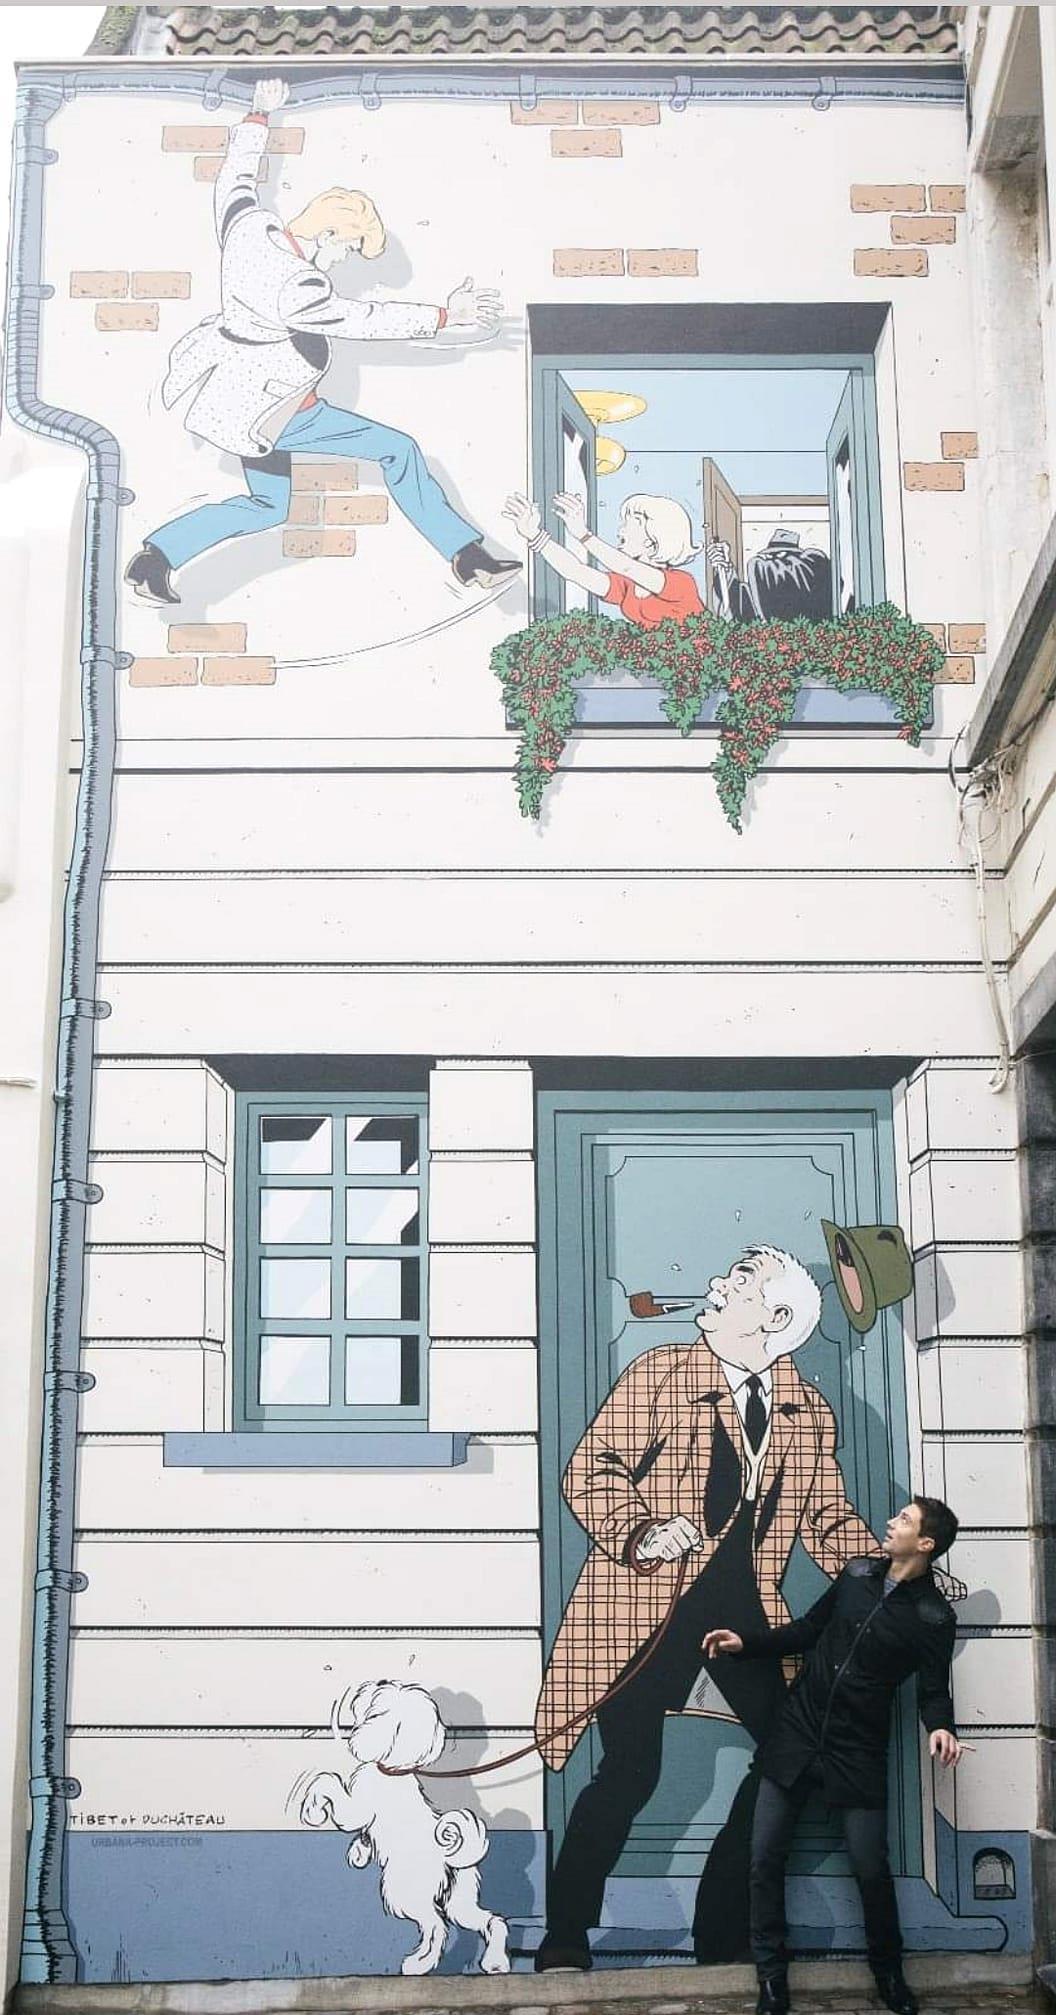 ruta-del-comic-en-bruselas-4